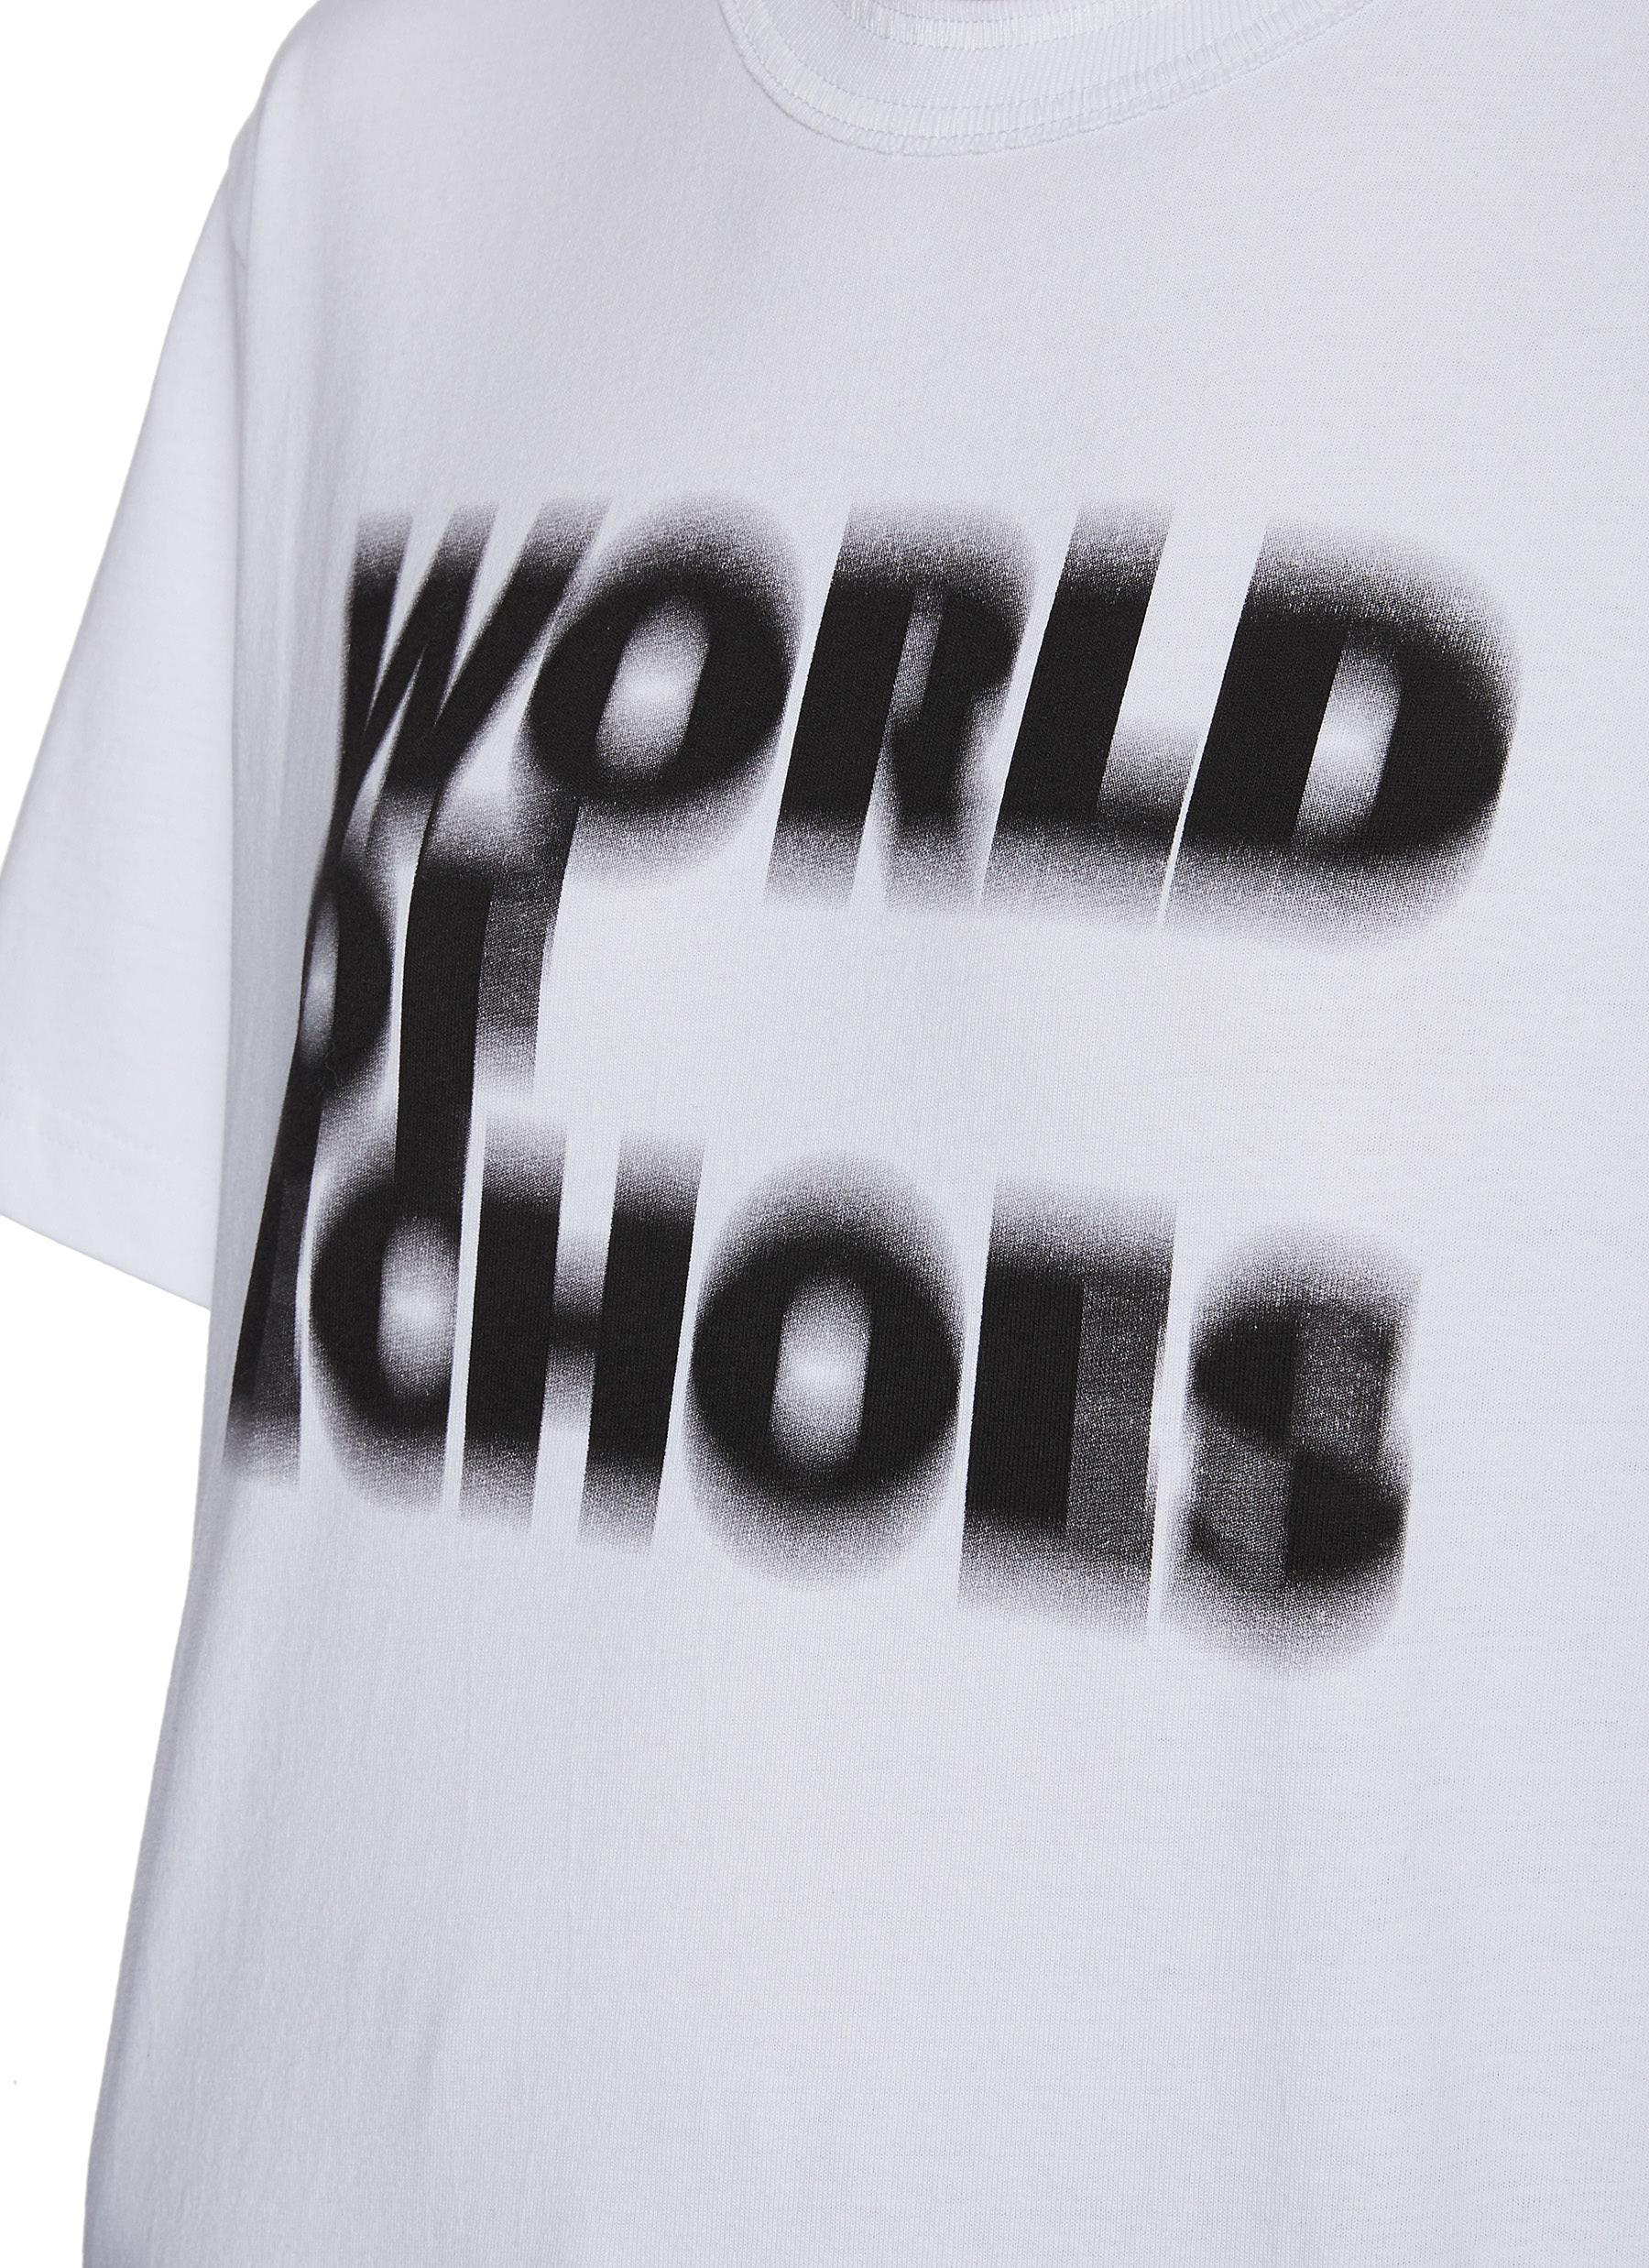 SACAI T-shirts X FRANÇOIS K. WORLD OF ECHOES SLOGAN LOGO PRINT T-SHIRT